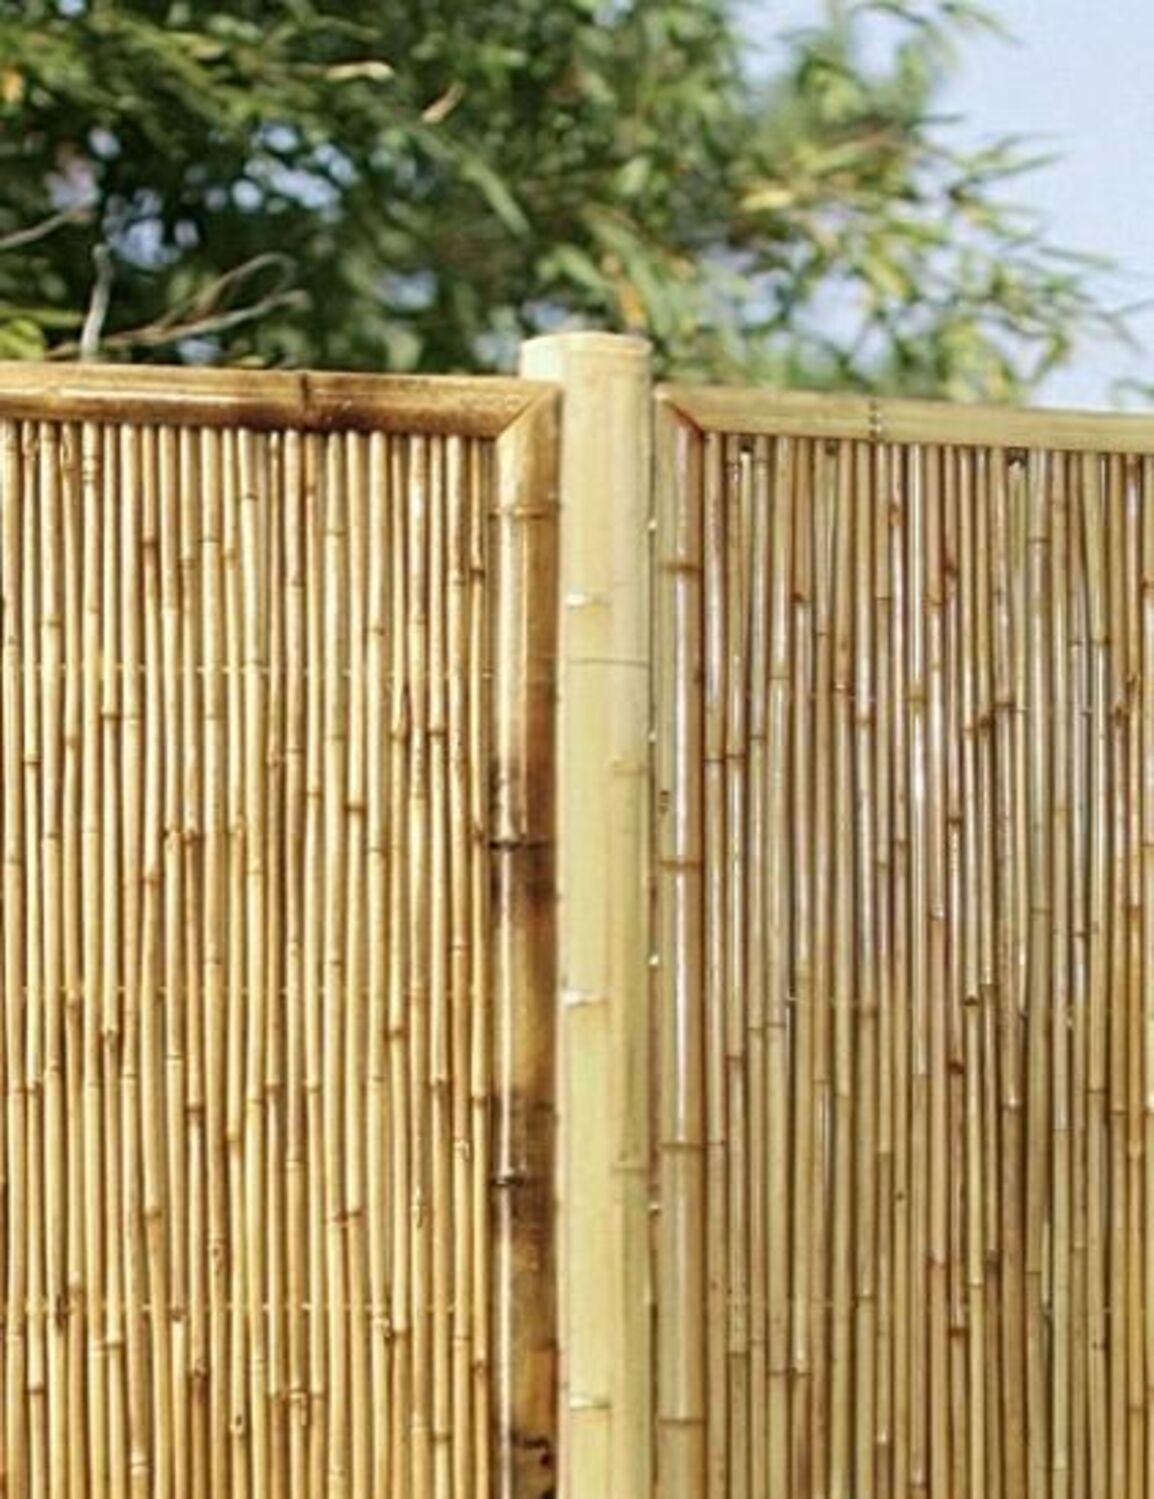 Mittelpfosten Aus Bambus Fur Sichtschutz Guan Zaun Gartenzaun